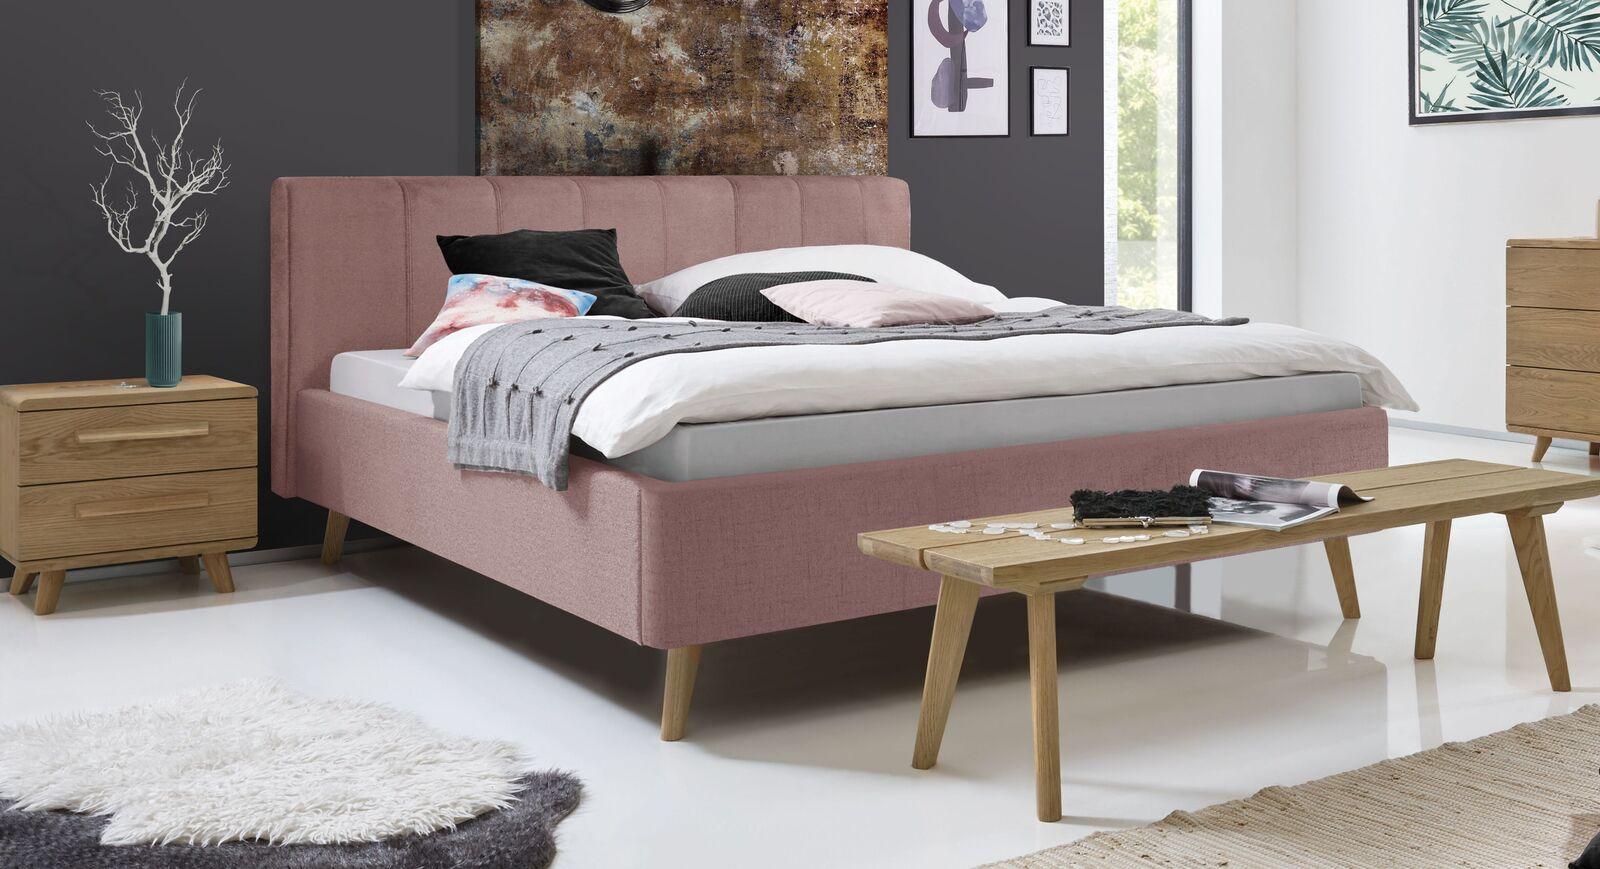 Bett Malvina mit rosefarbenem Bezug